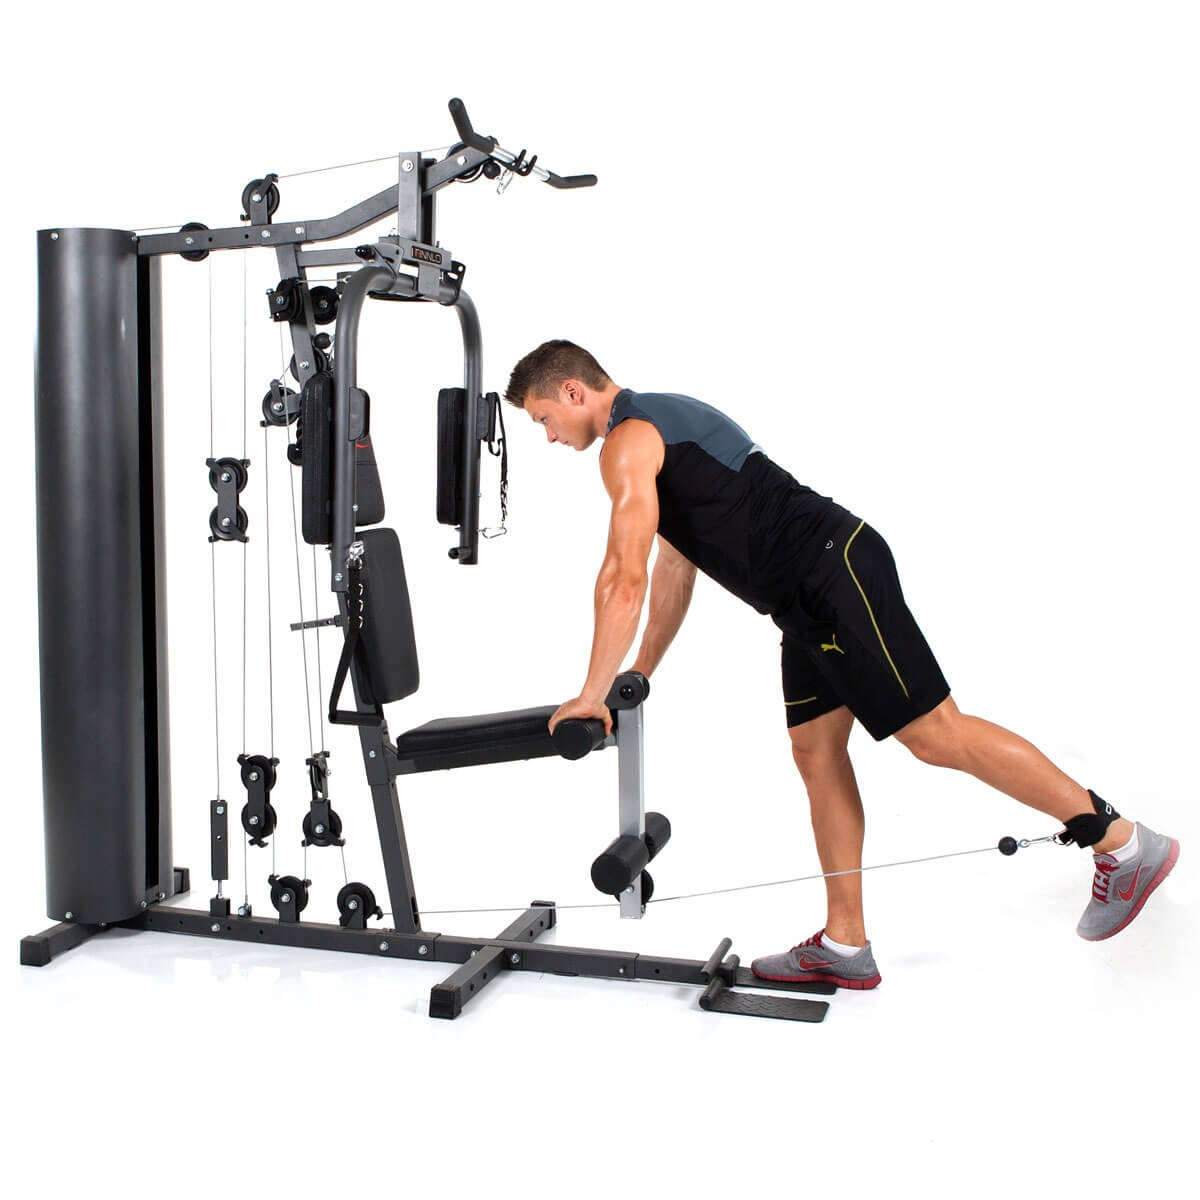 Finnlo Multi Gym Station Autark 600 Buy Now